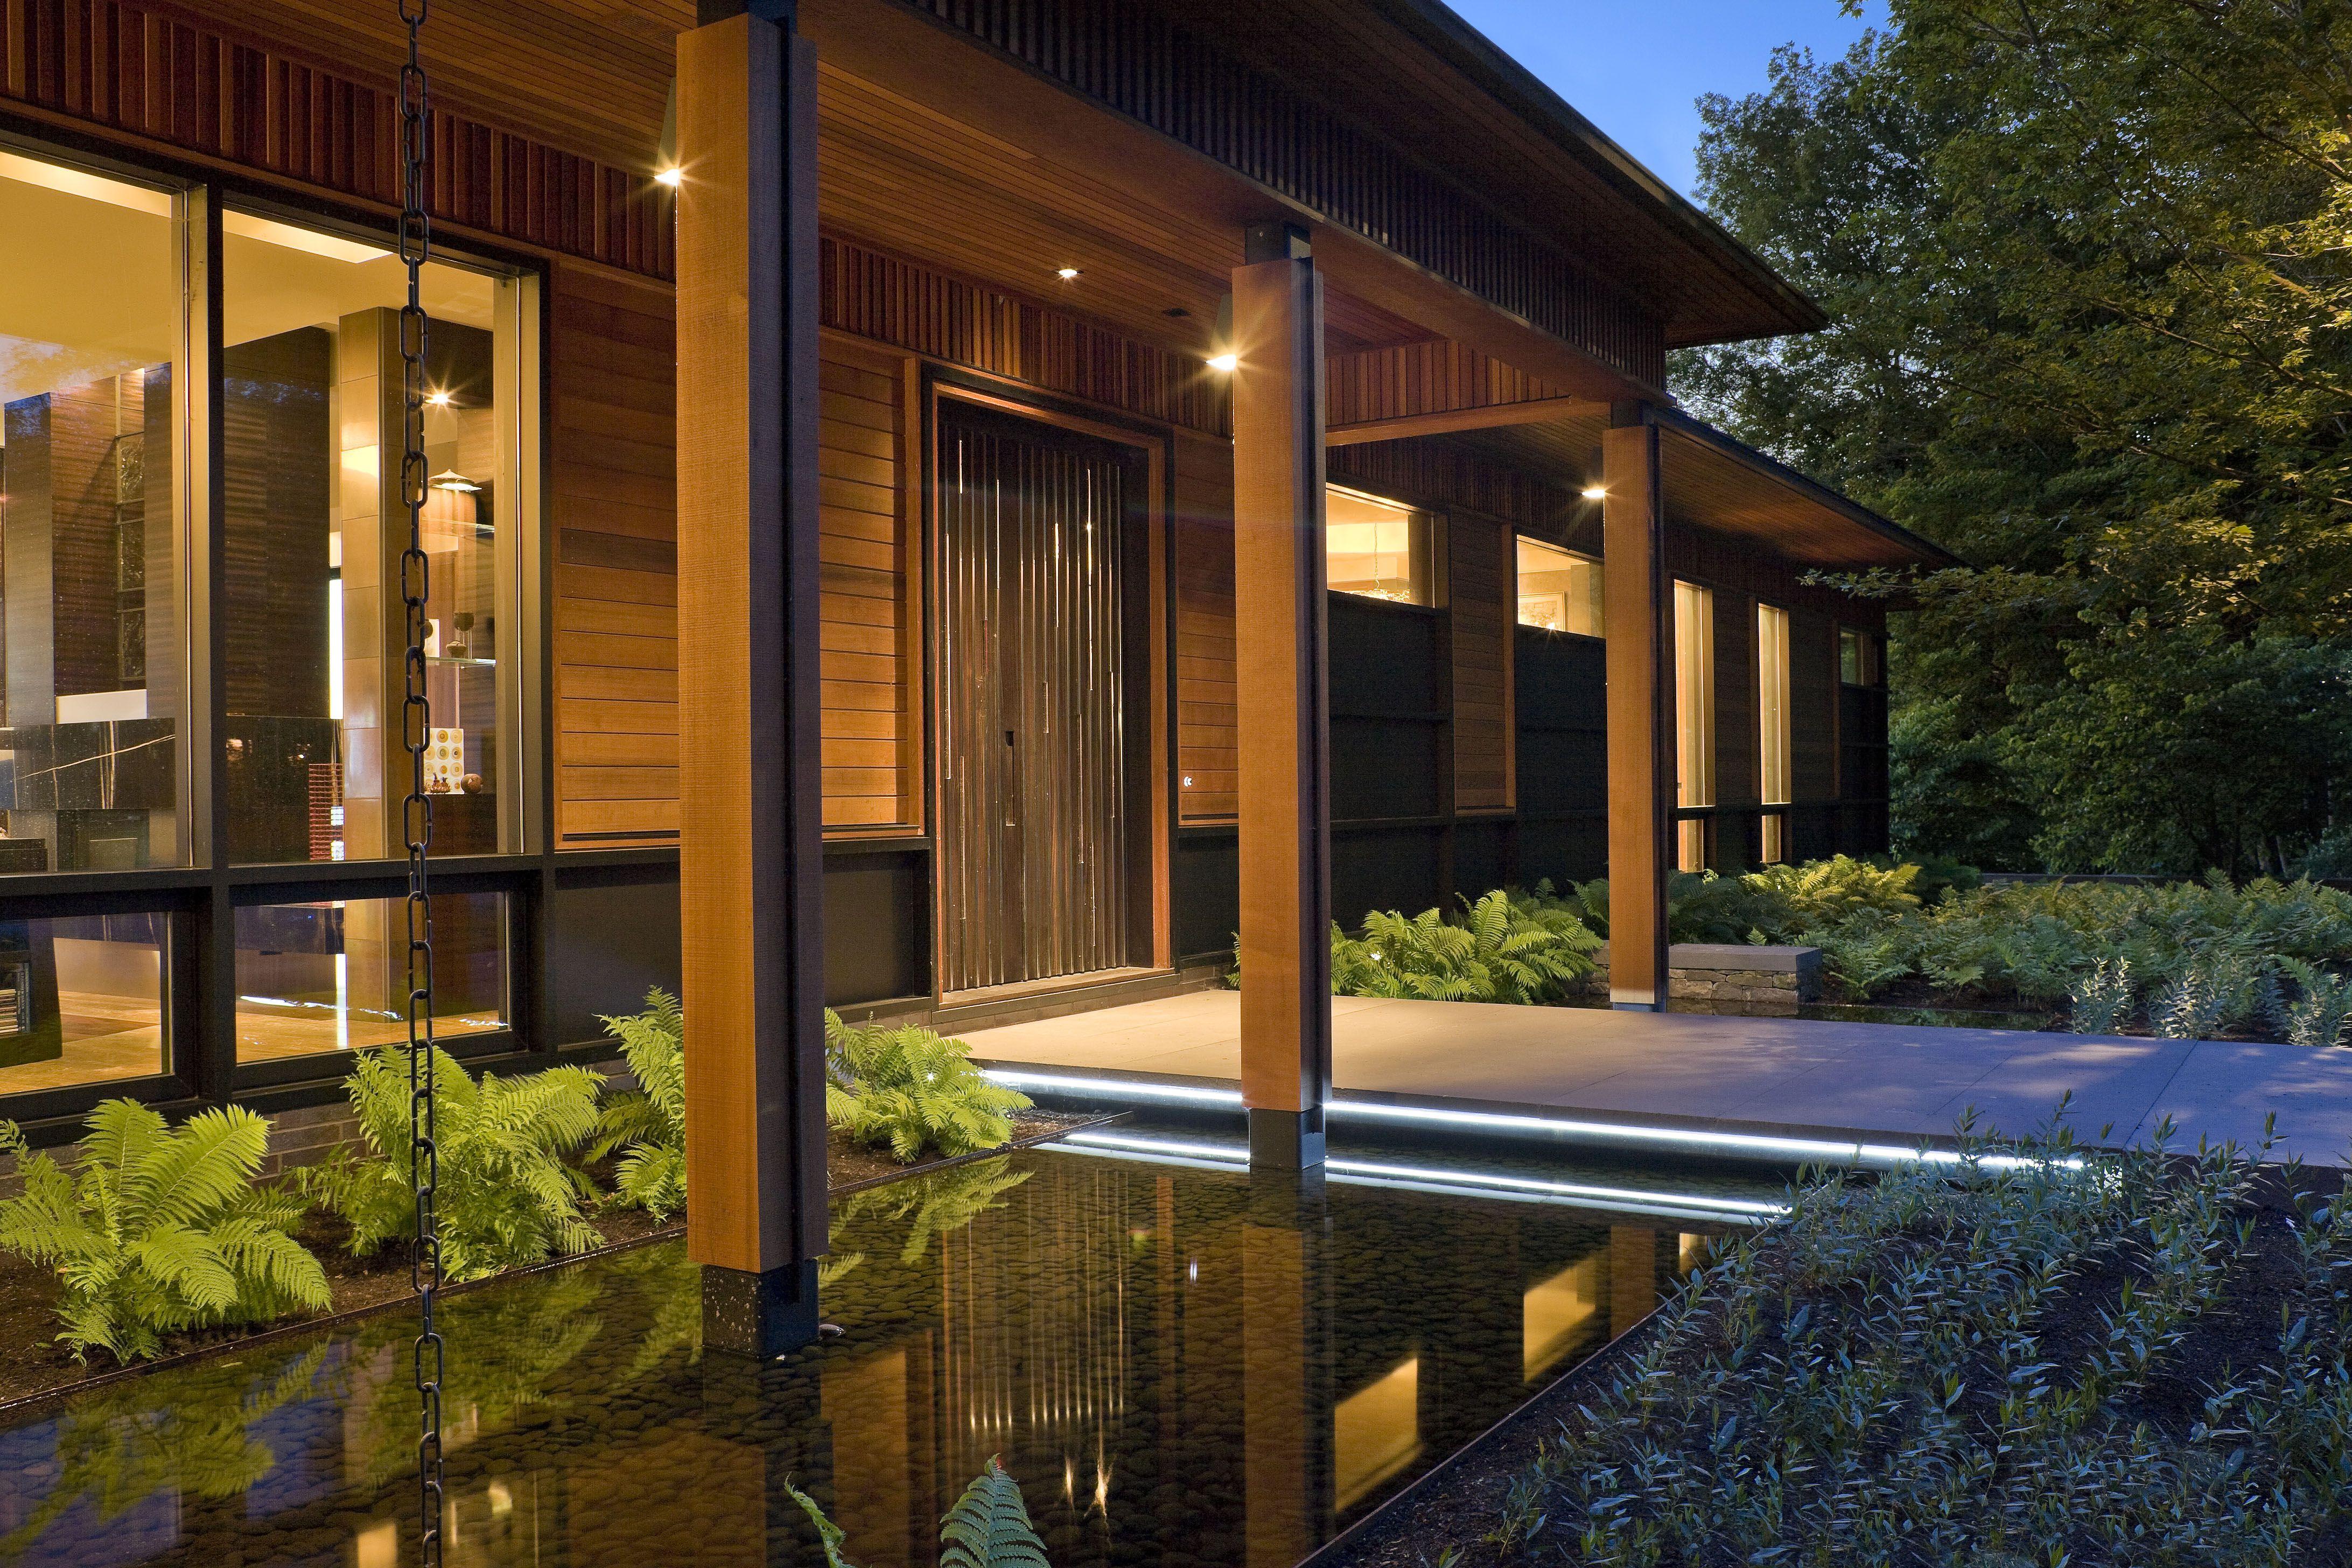 Landscape Architect: H. Keith